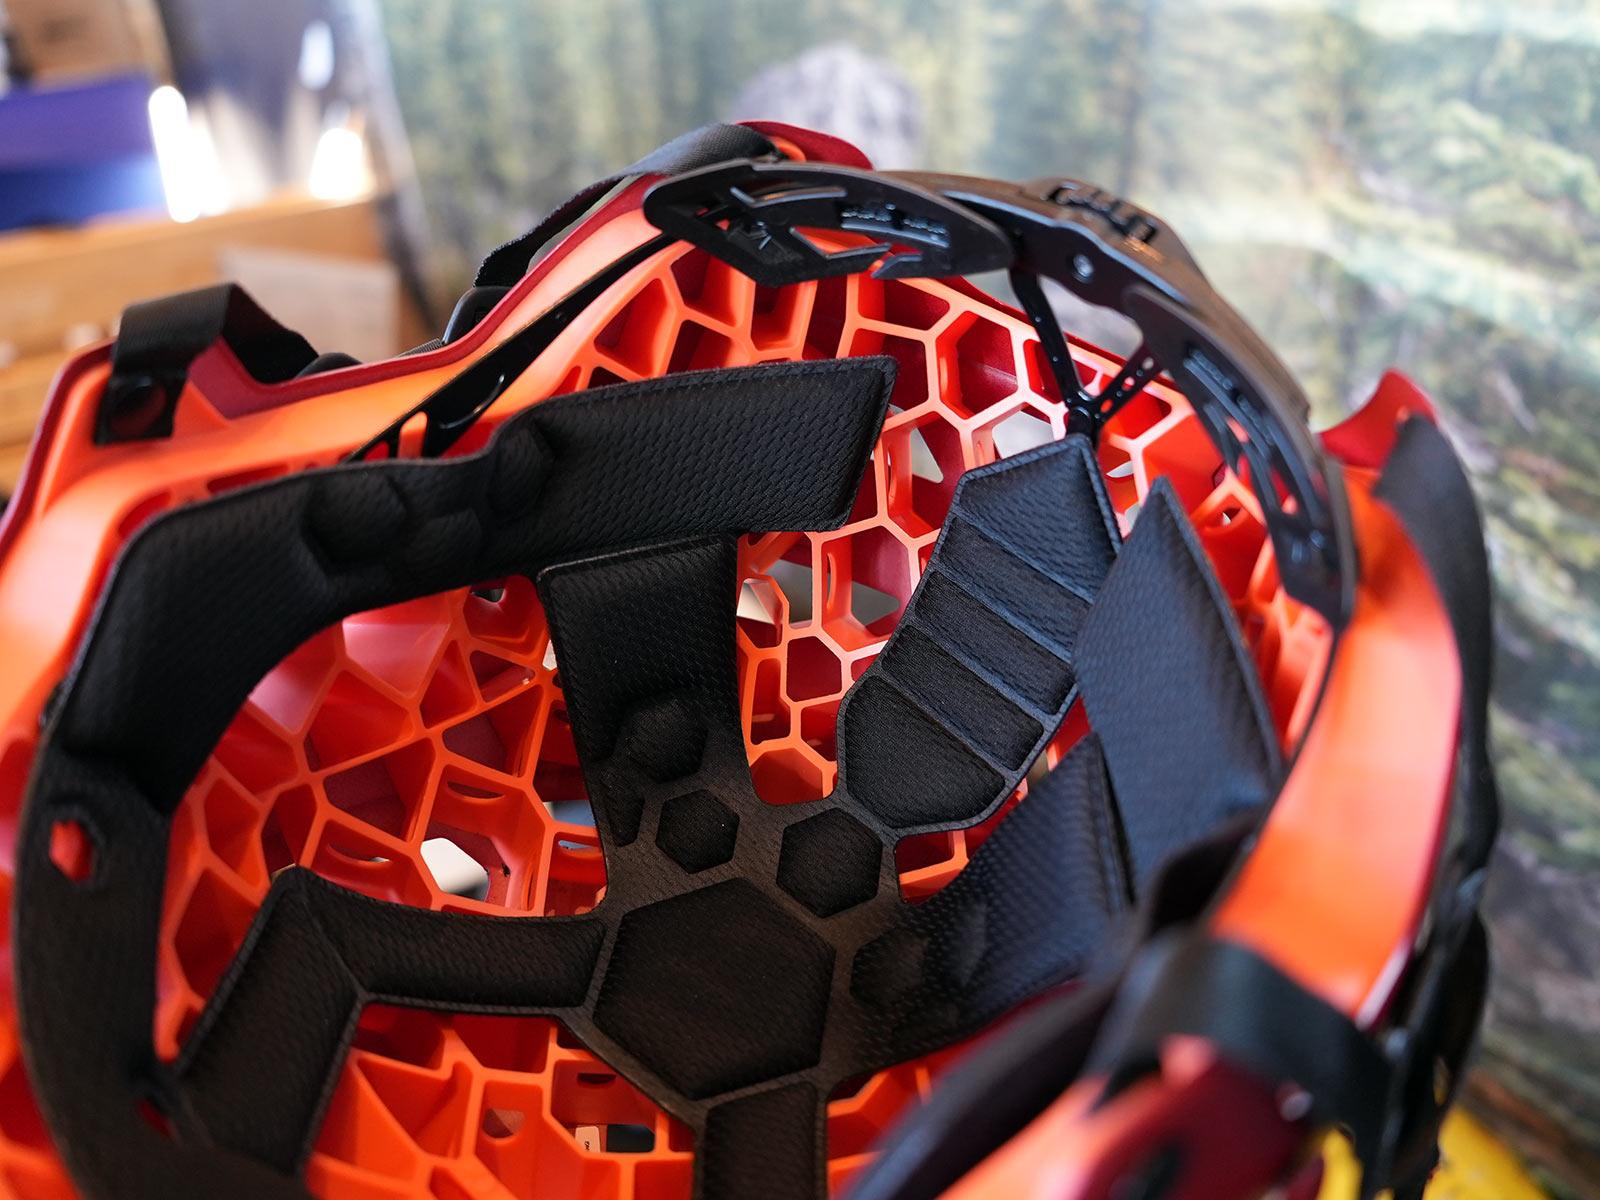 internal look at hexagonal padding structure of 720 bike helmets